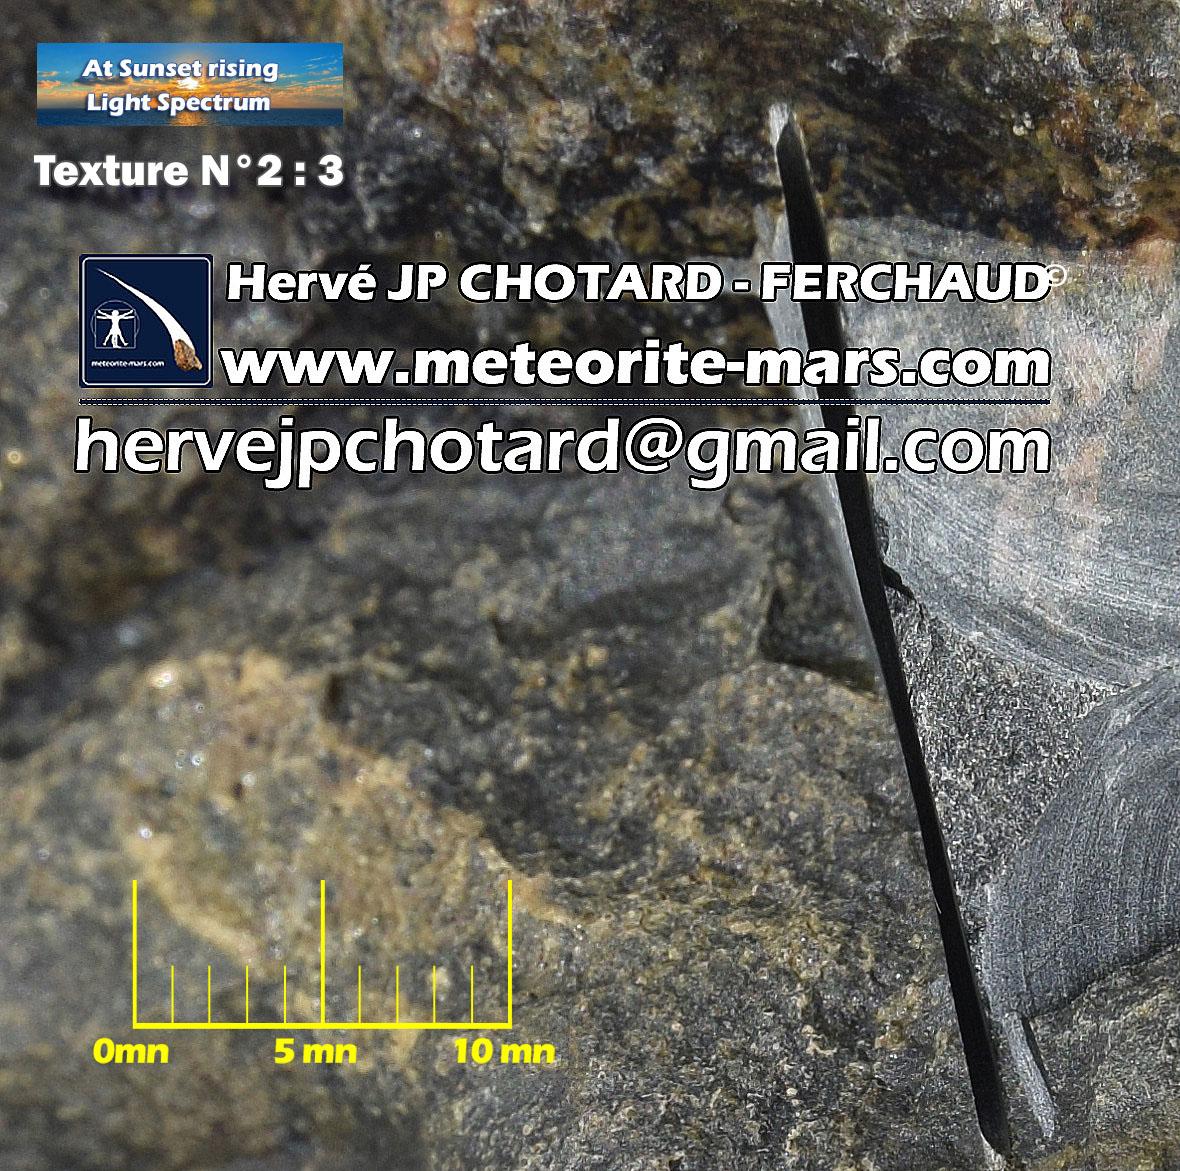 textute 2-3 www.meteorite-mars.com